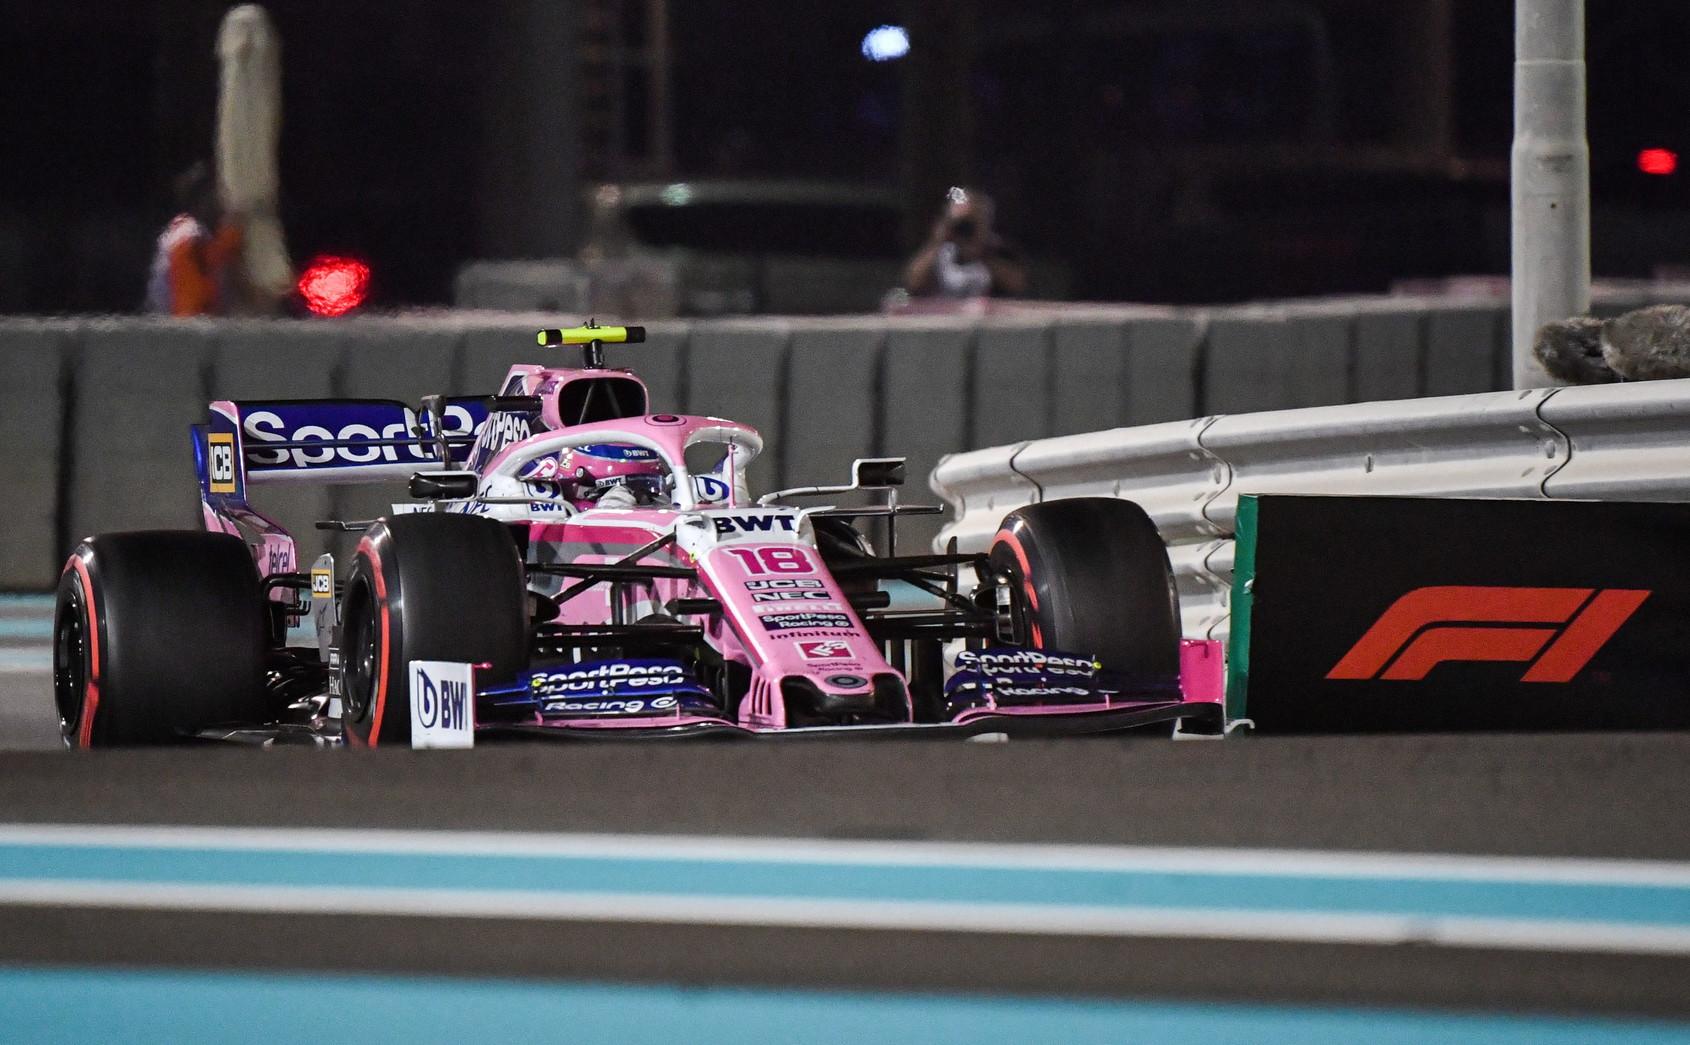 8) Racing Point (130 milioni di dollari di valore; 104 milioni di dollari di ricavo)